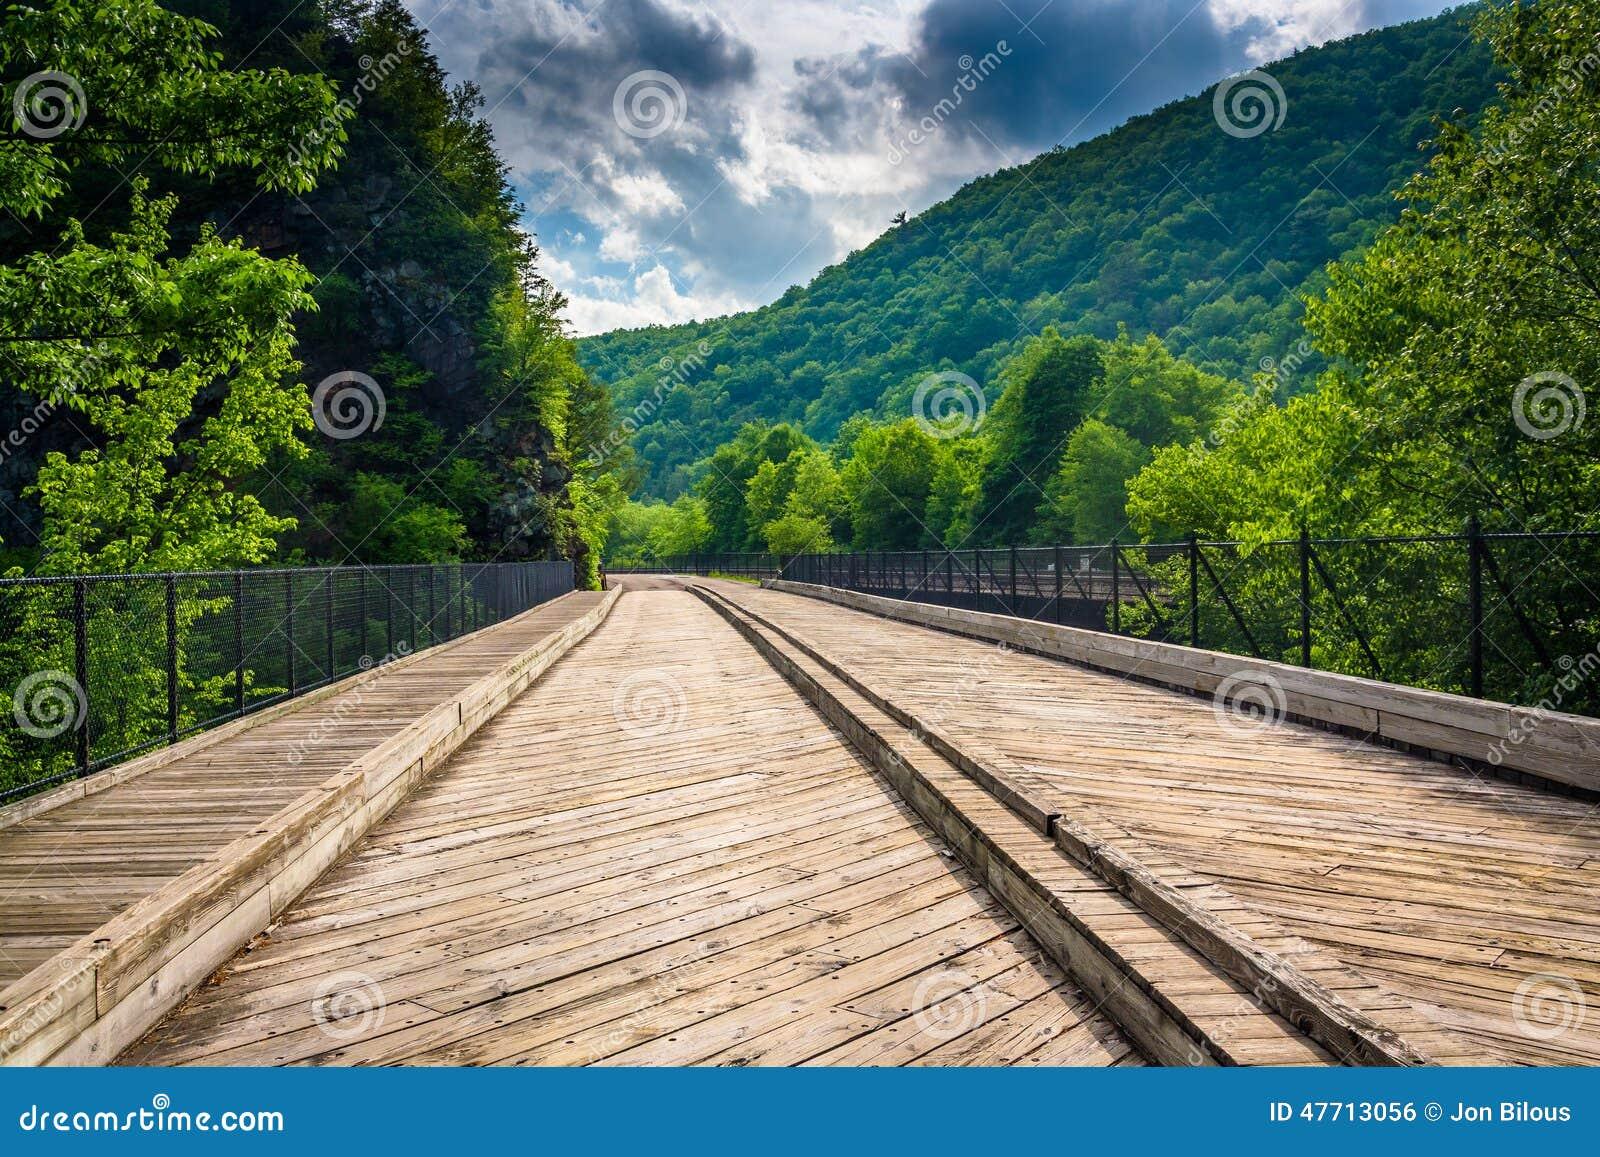 Bridge and mountains in Lehigh Gorge State Park, Pennsylvania.